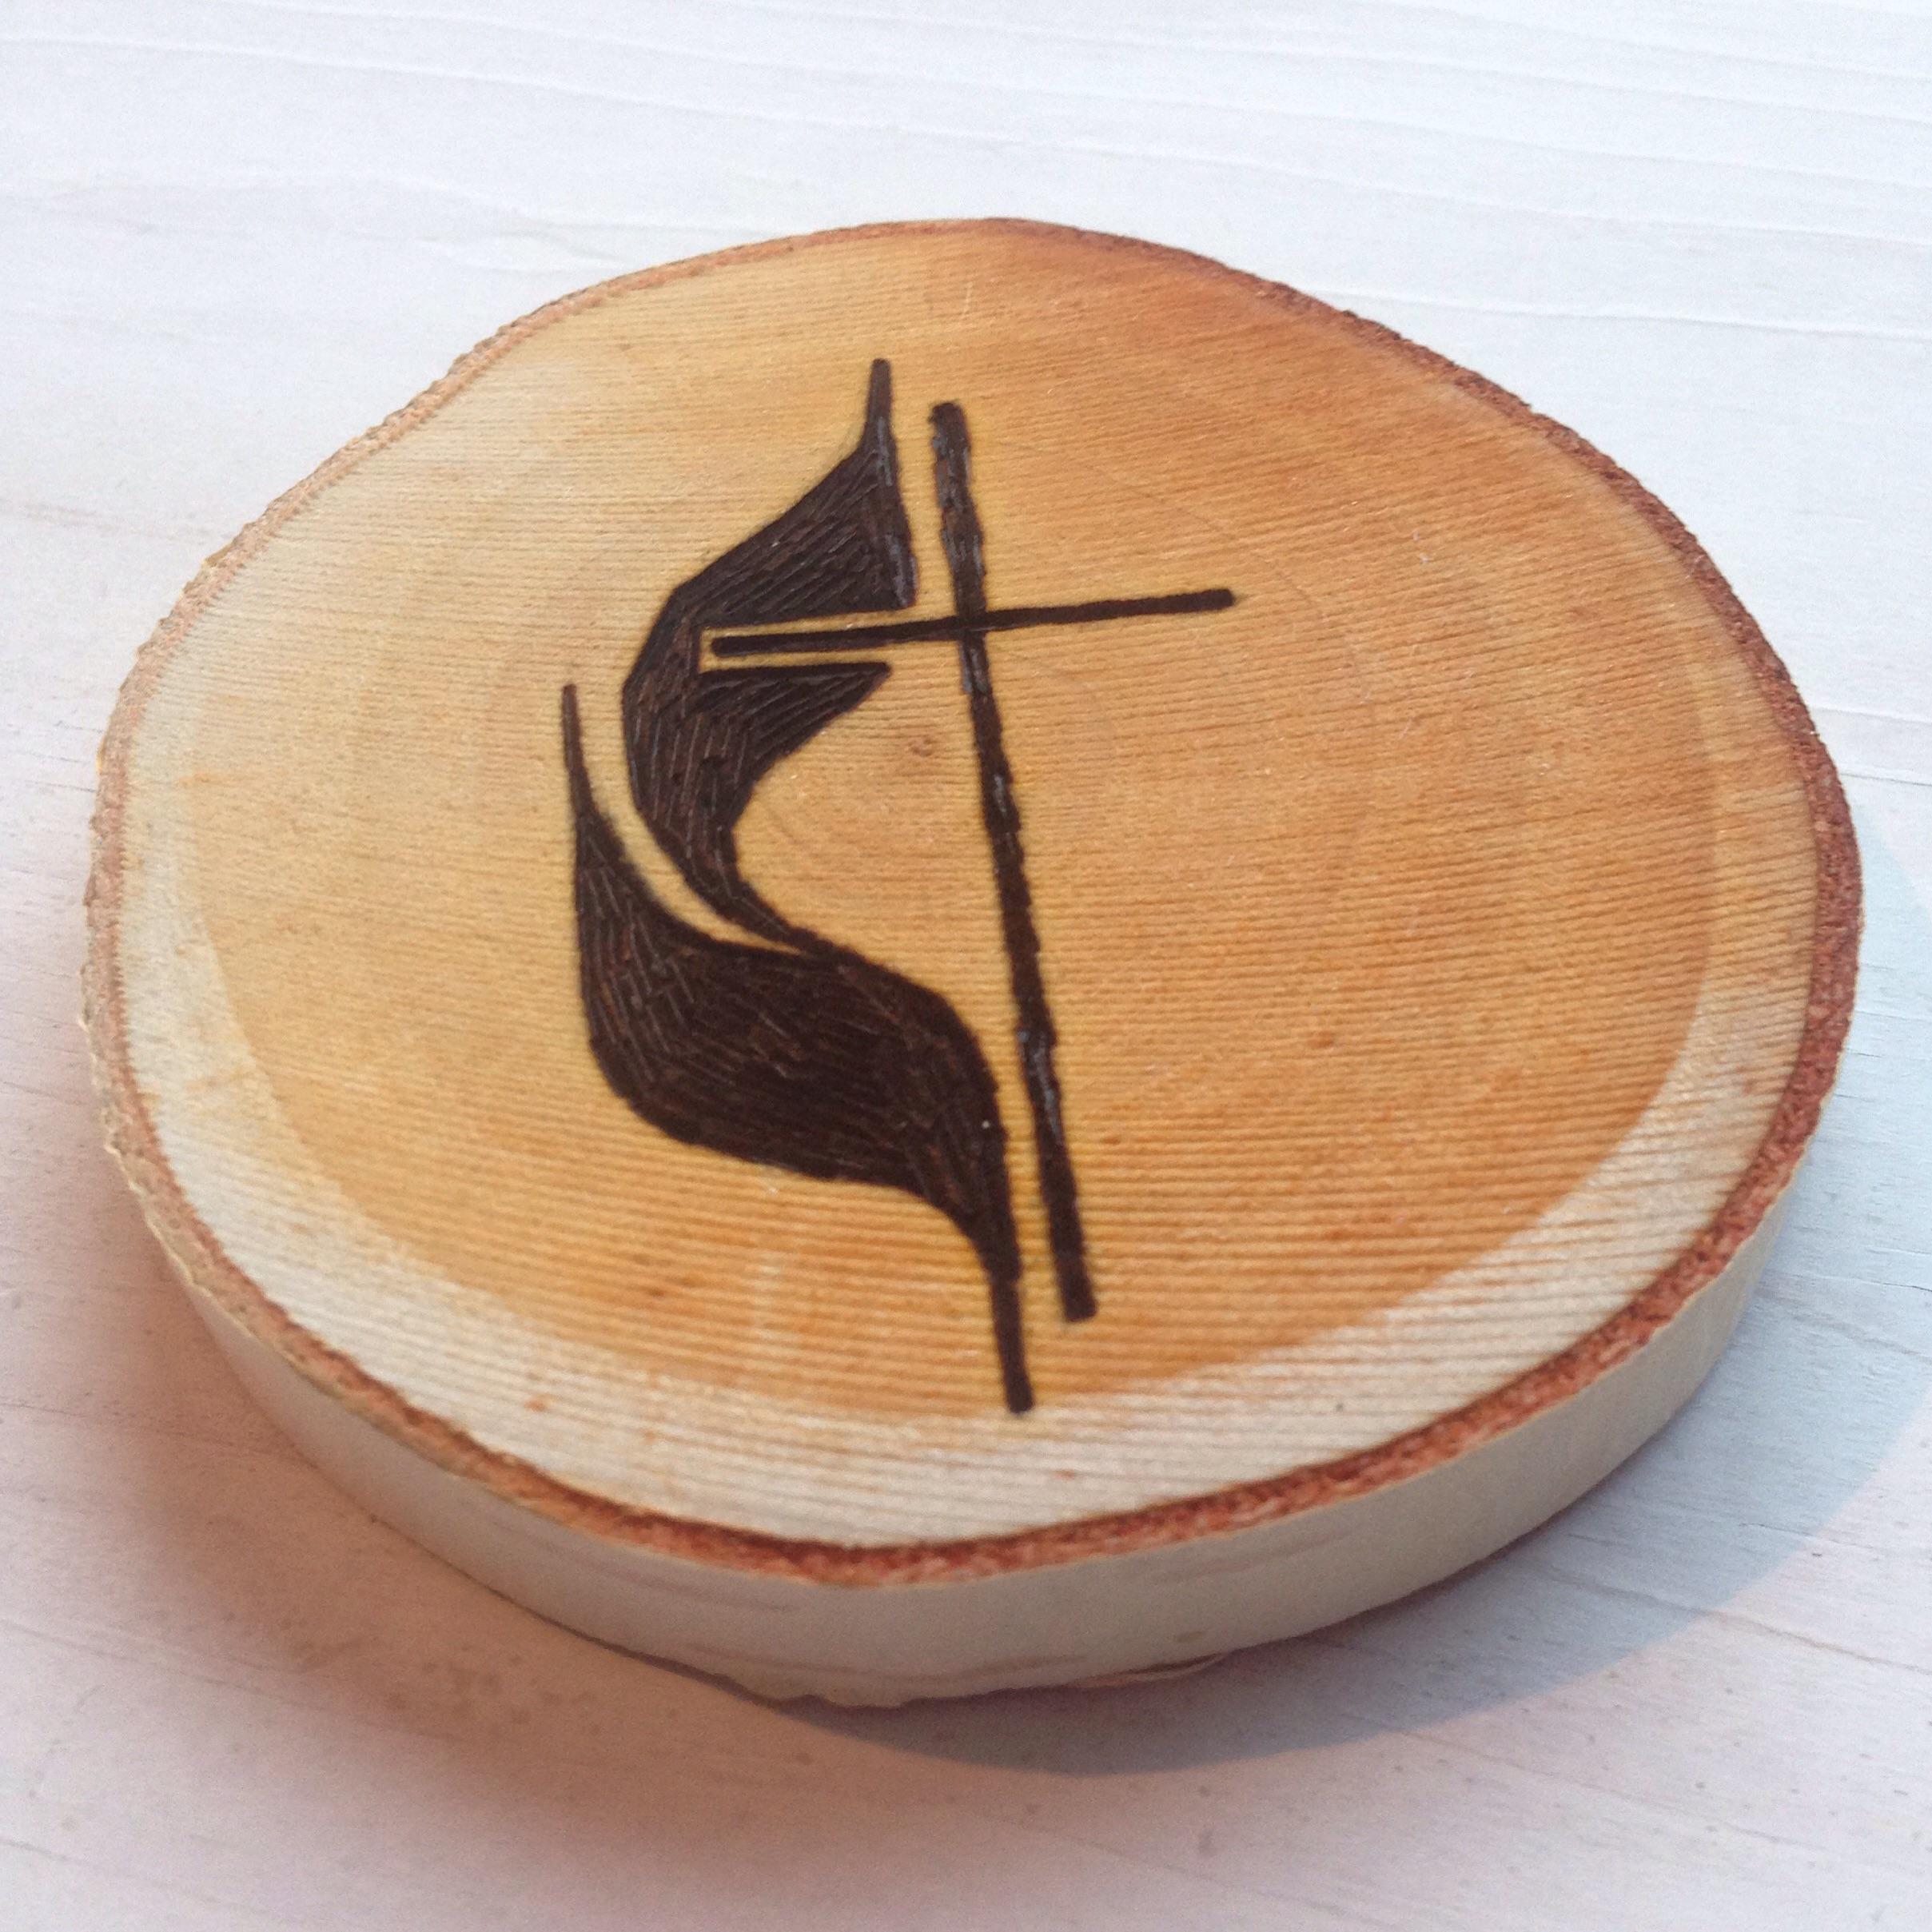 Custom Methodist Cross ornament in the making.